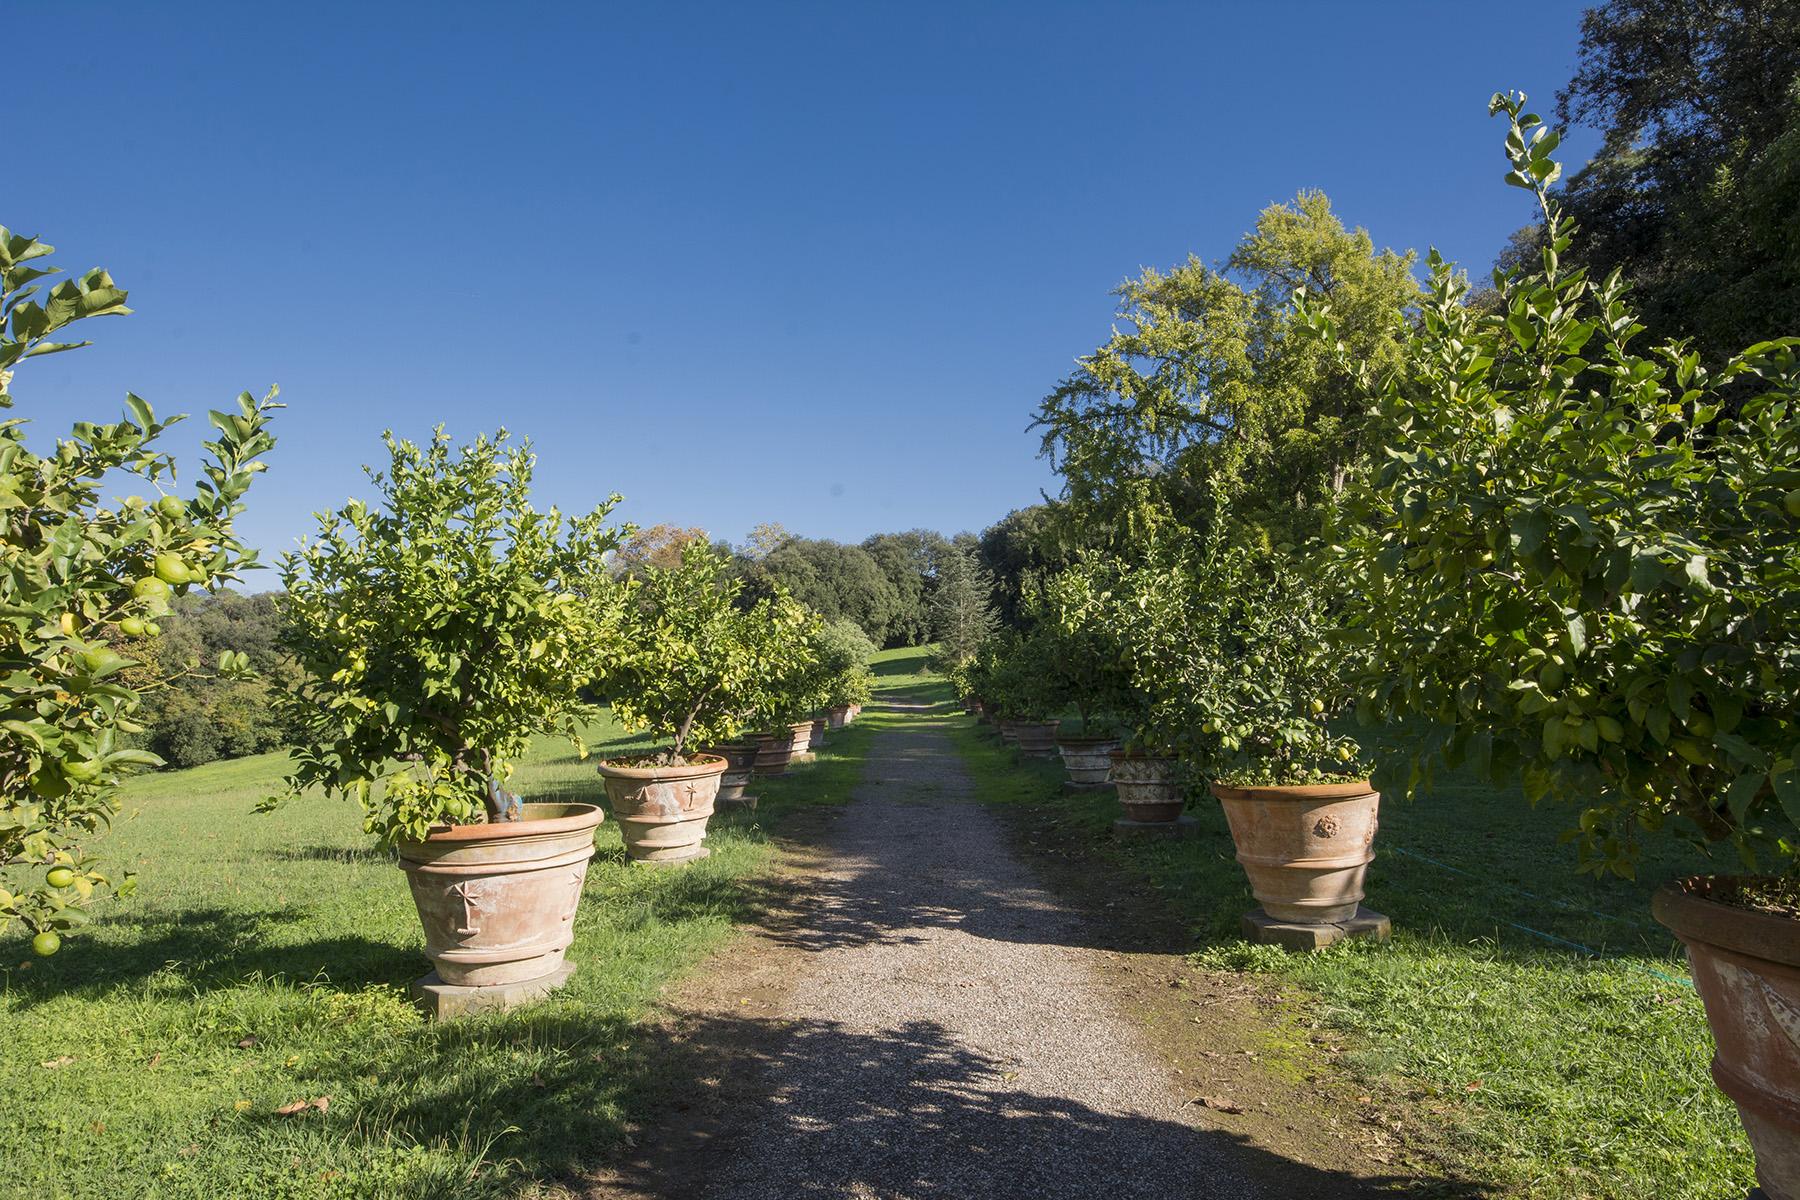 Villa in Vendita a Lucca: 5 locali, 2451 mq - Foto 17